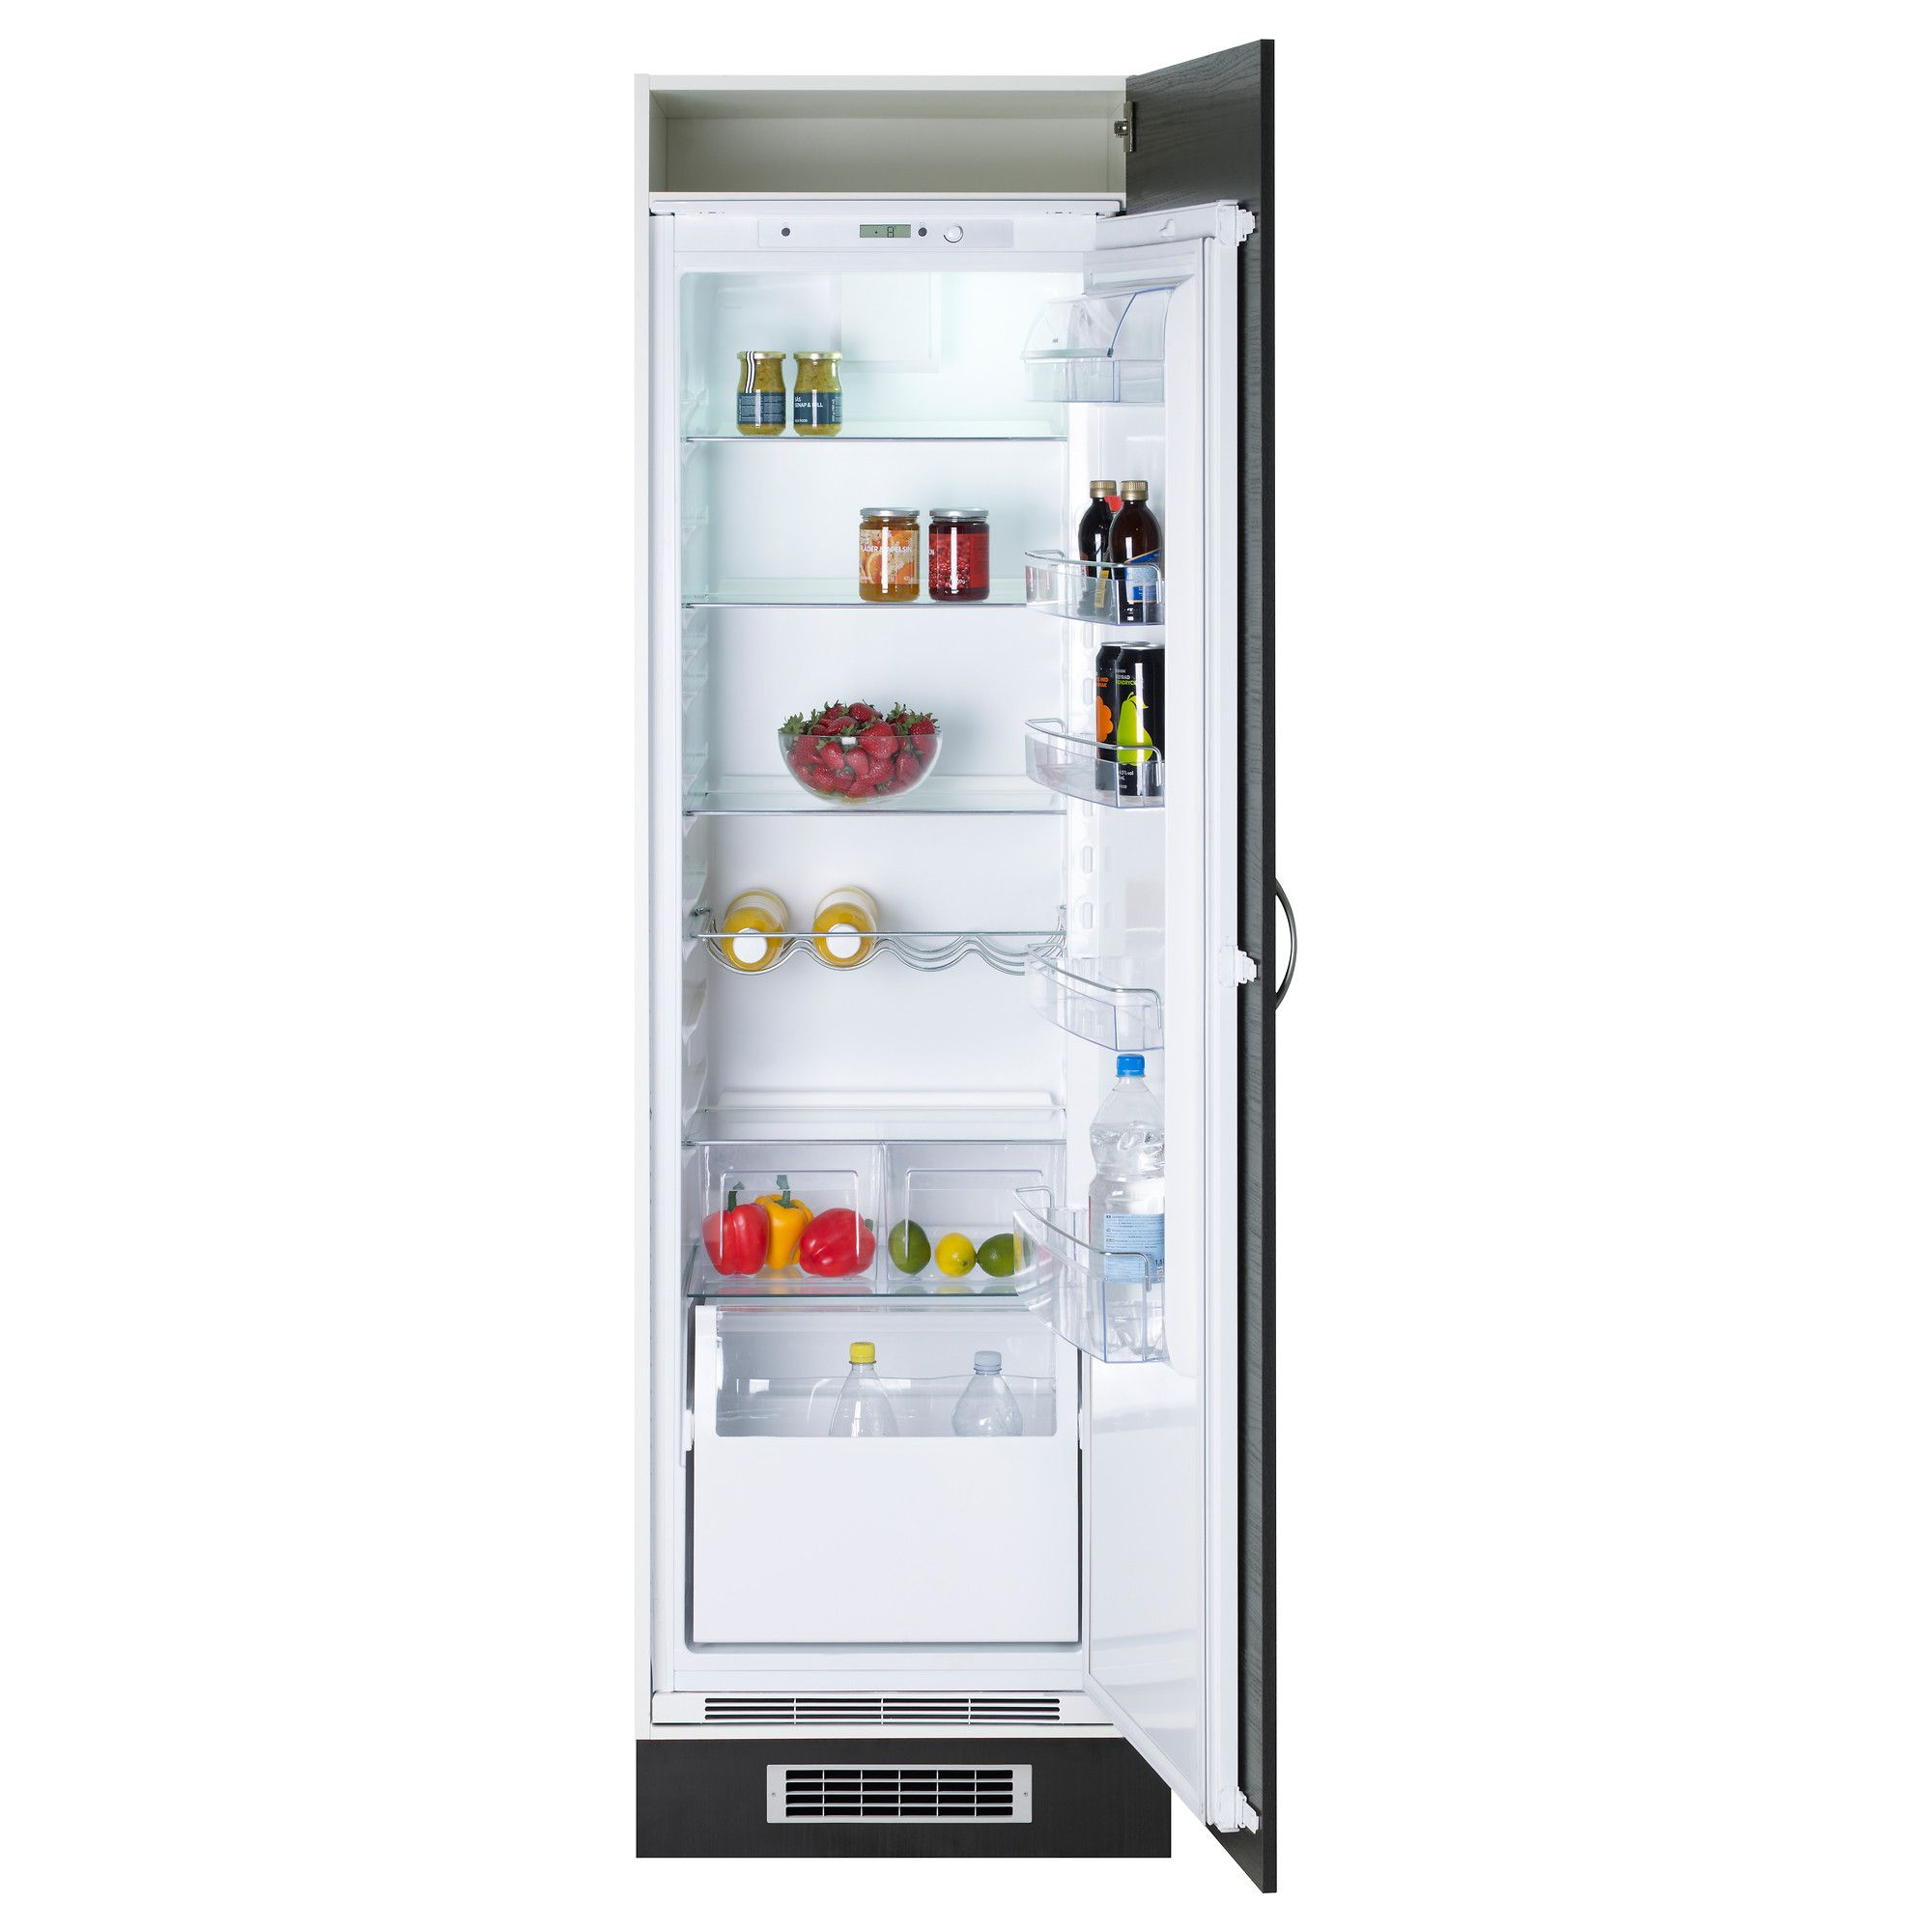 FROSTIG Integreret køleskab A+ - IKEA | Majken & Jacob | Pinterest ...